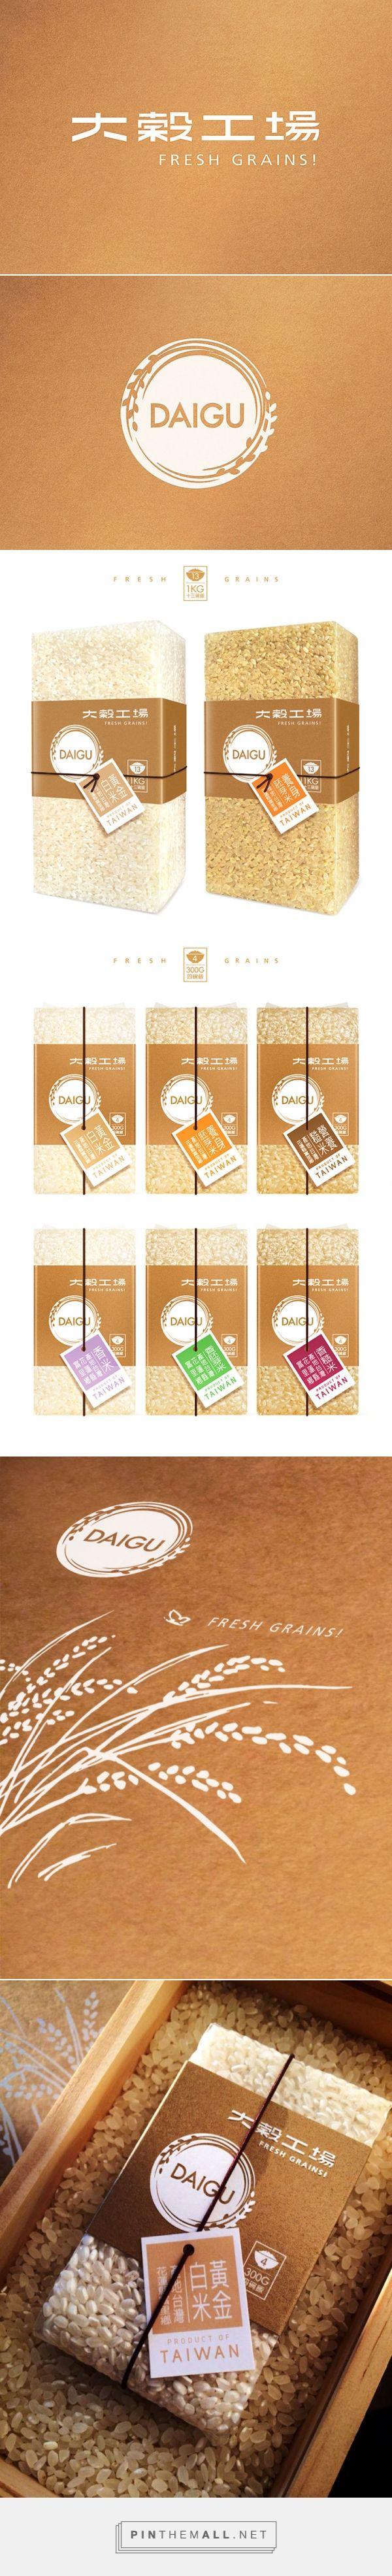 大穀工場 DAIGU FRESH GRAINS! 以米為核心,致力於開創新米文化 on Behance by Akun Kuo curated by…